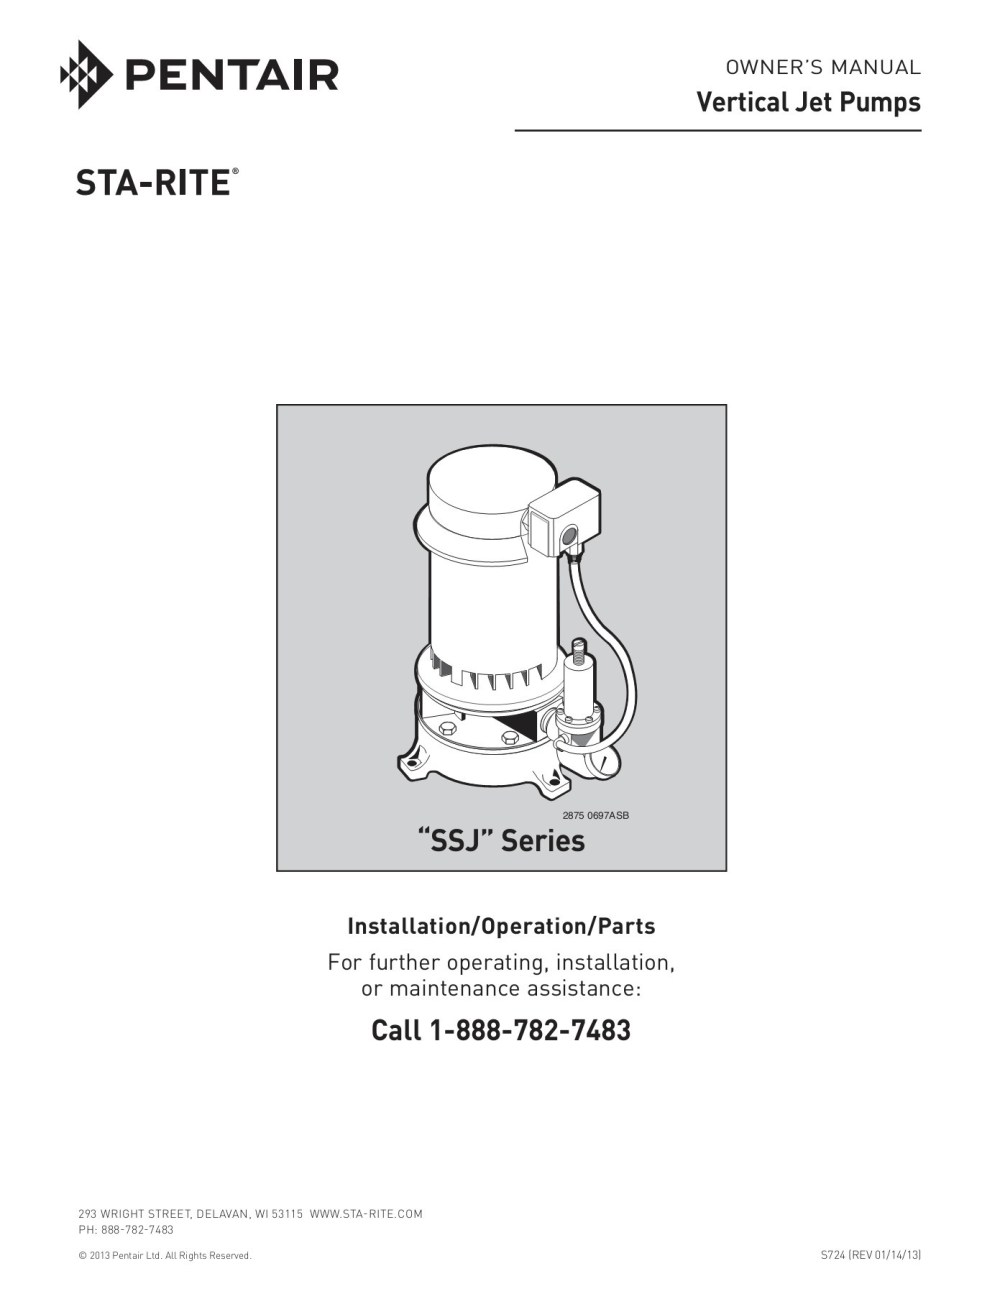 medium resolution of owner s manual vertical jet pumps sta rite